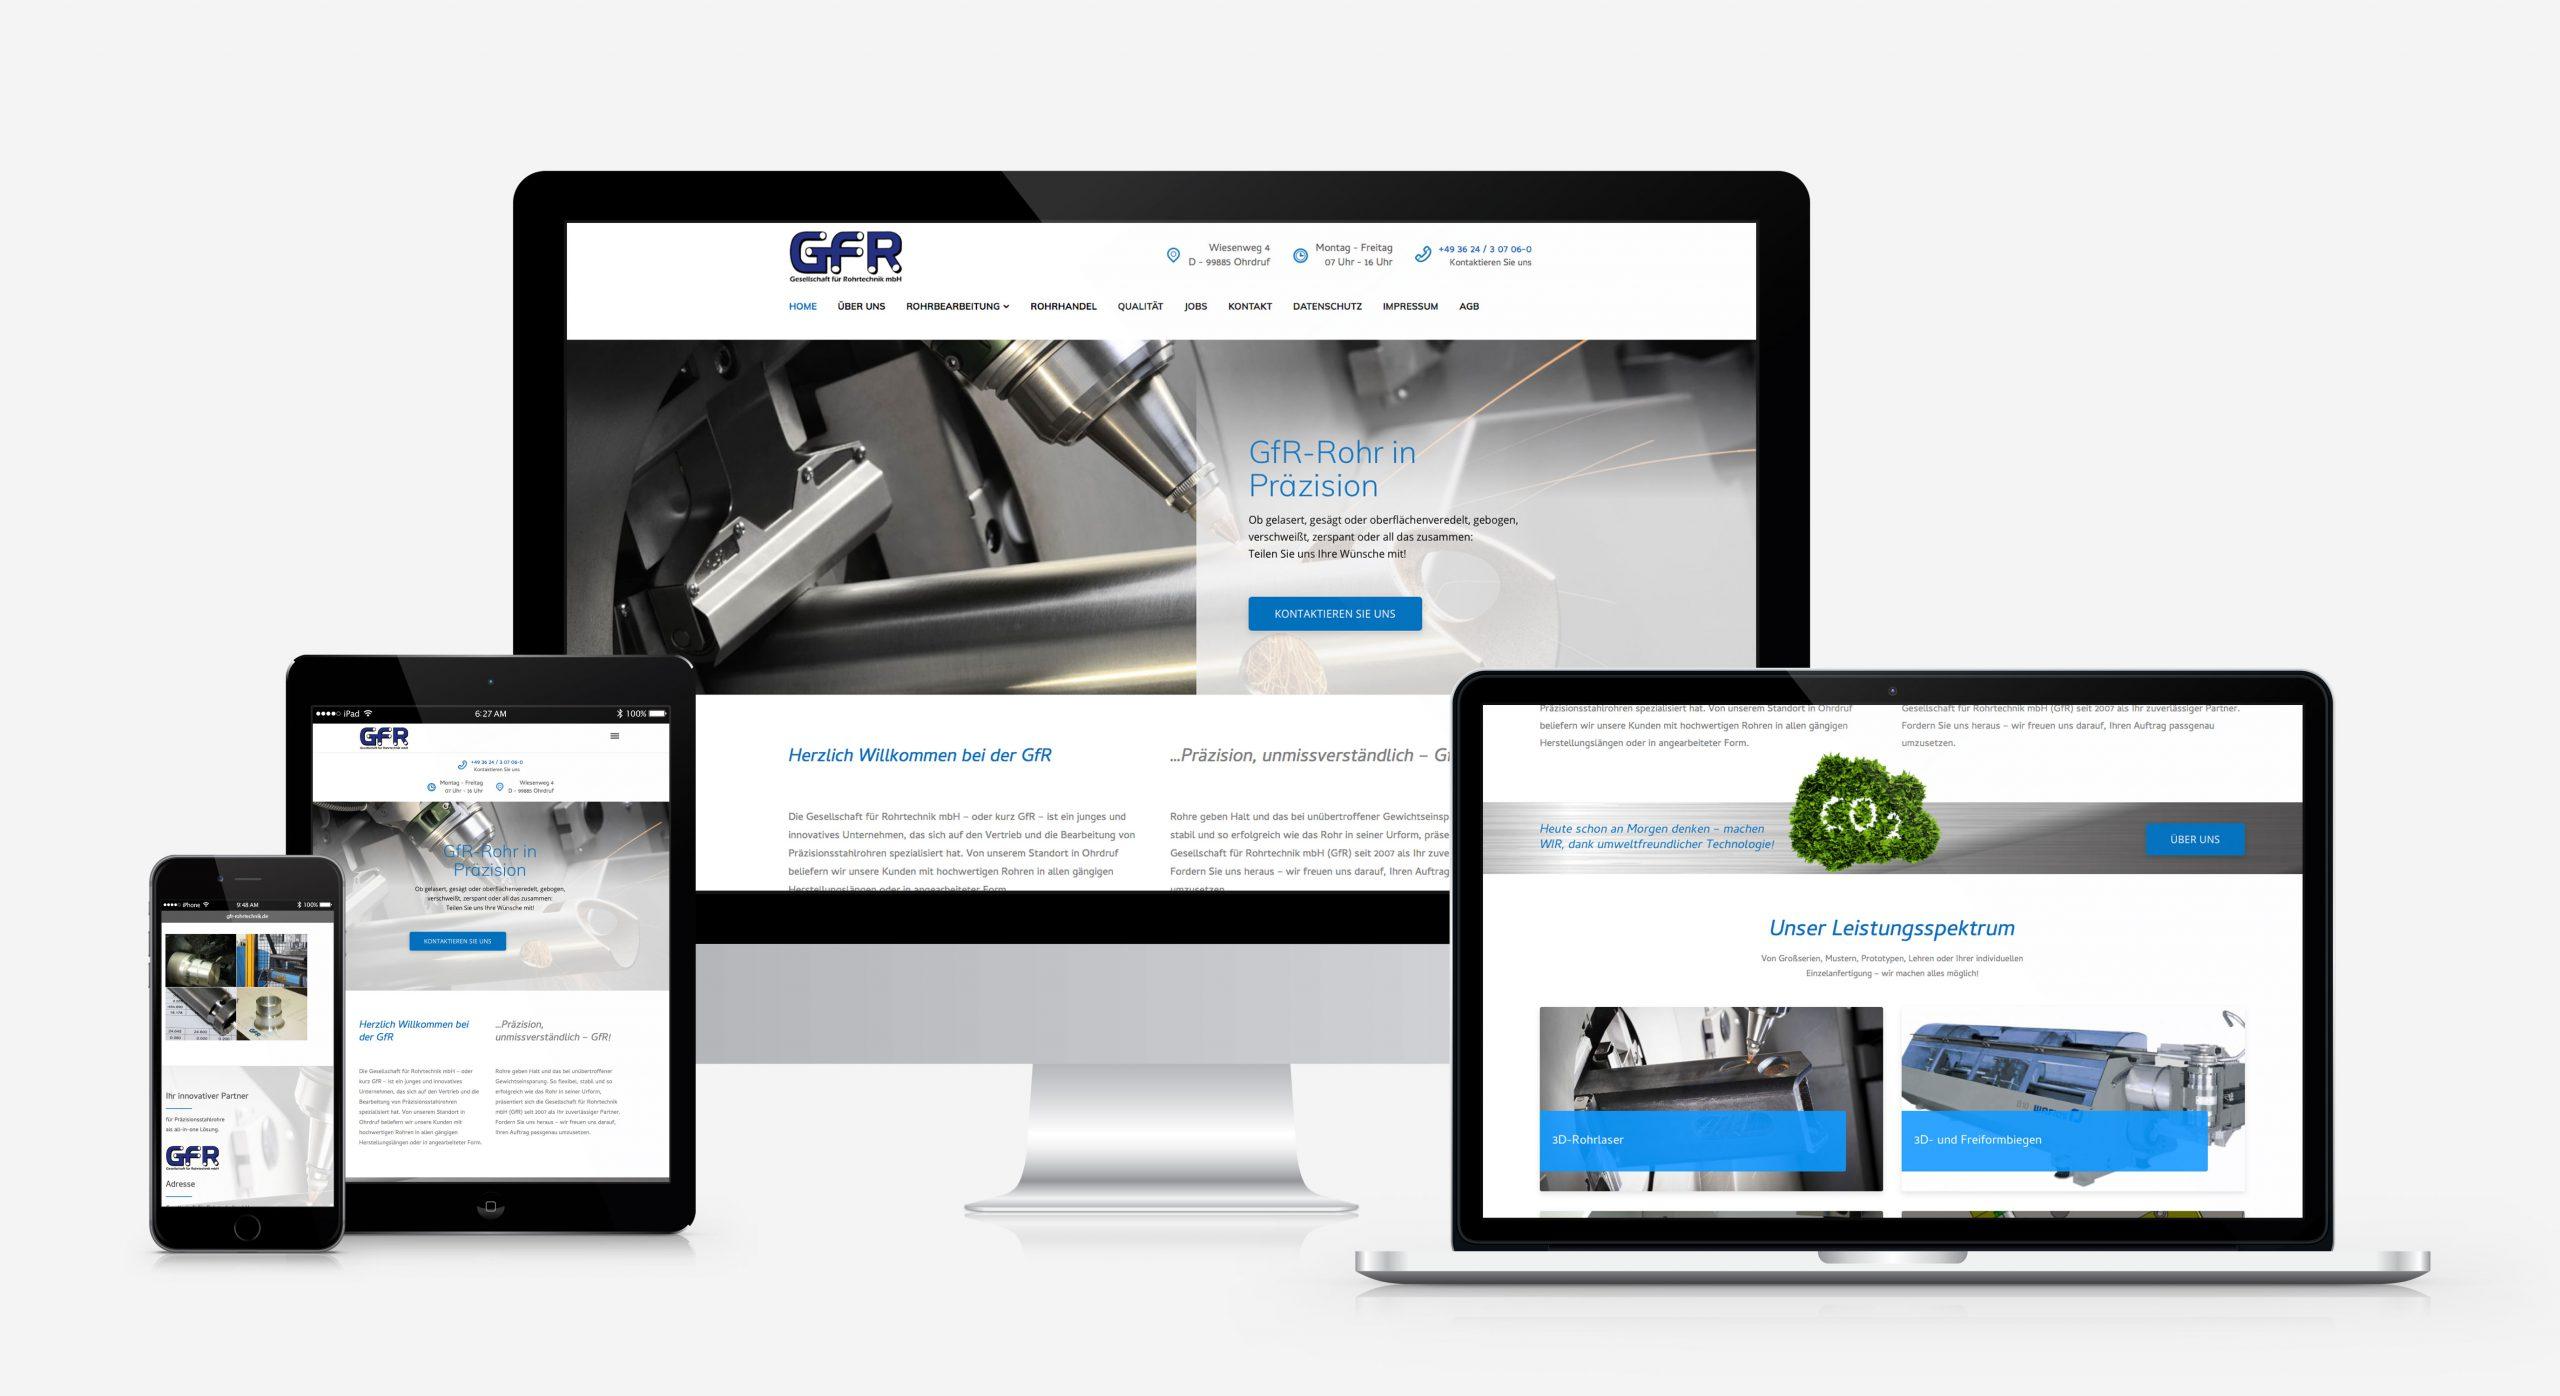 GFR Rohrtechnik